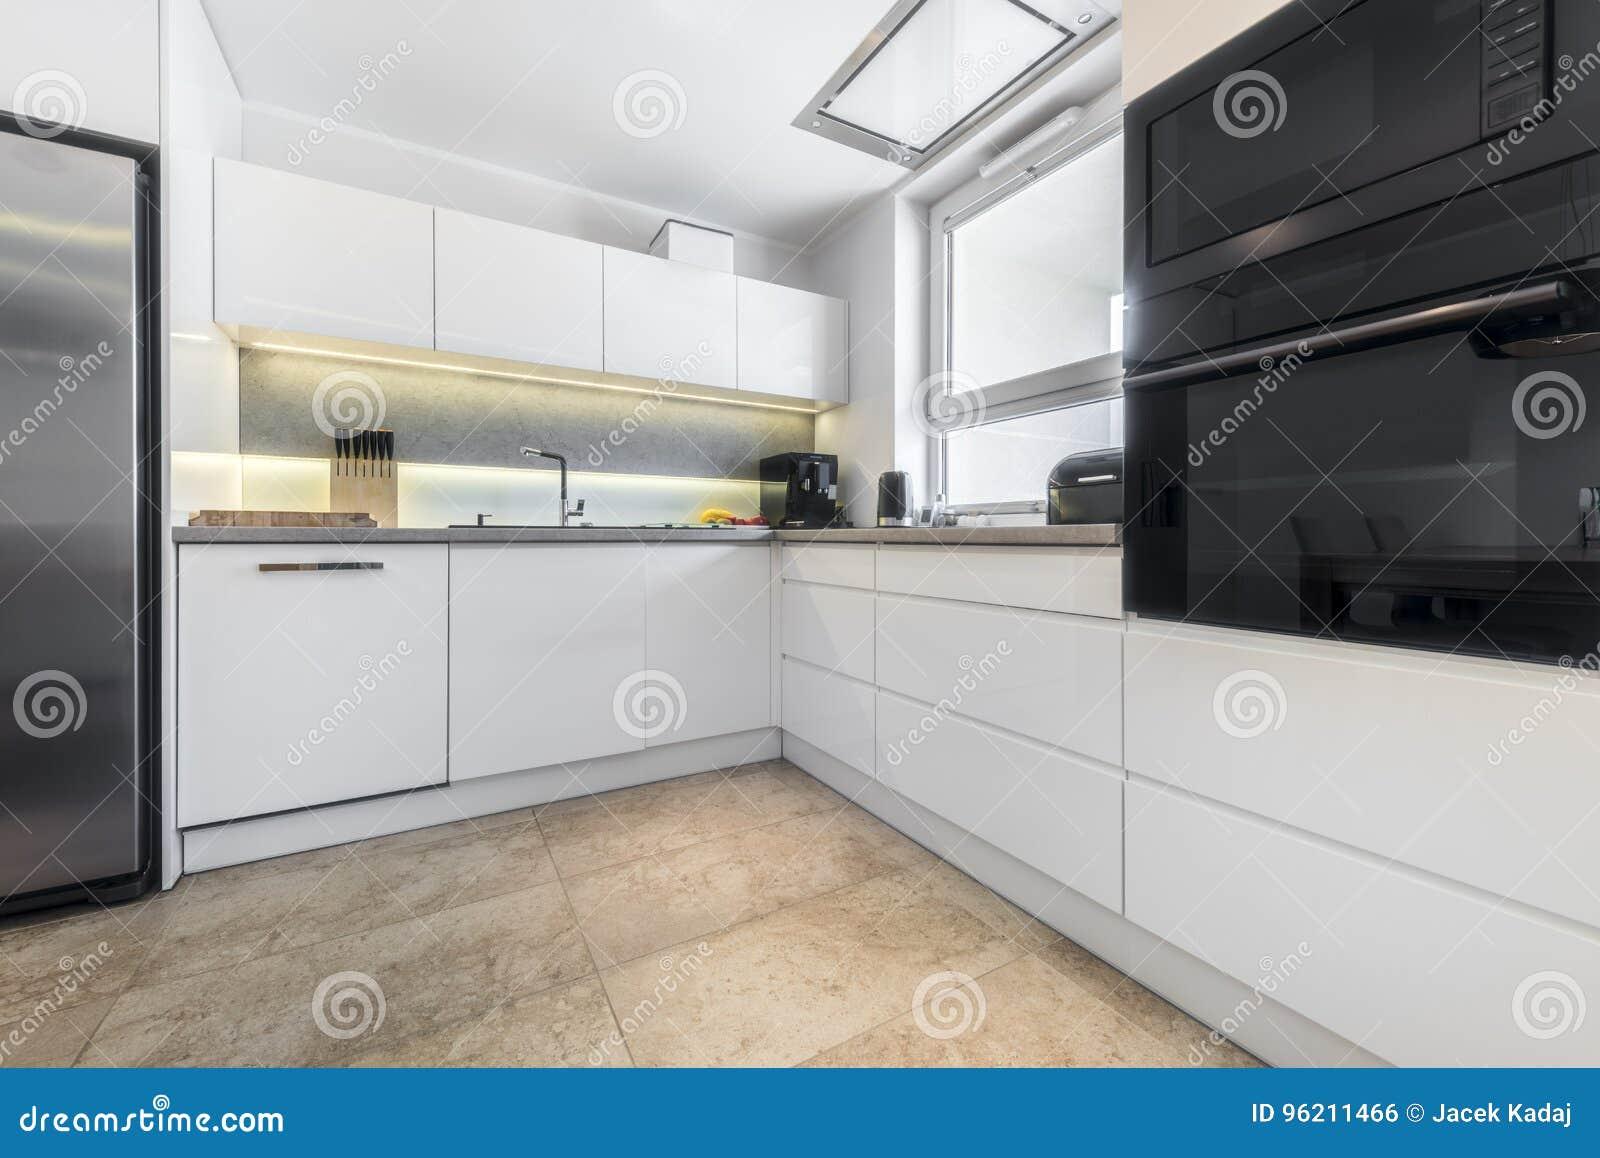 Modern Kitchen Interior Design Stock Photo - Image of counter, built ...